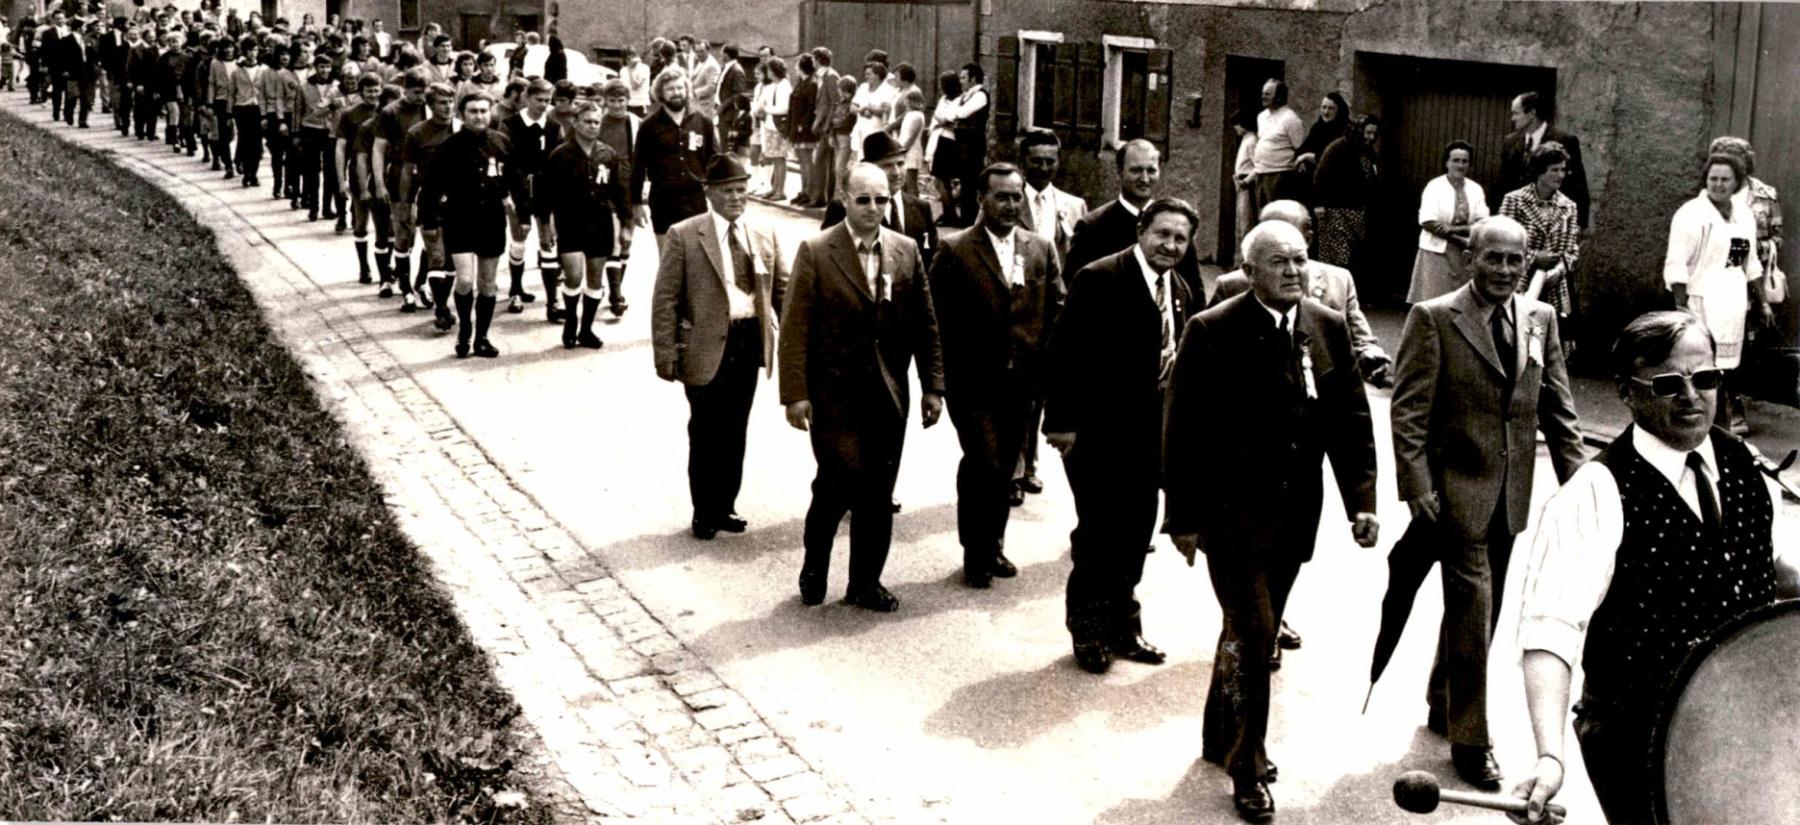 1973_Sportplatzeinweihung_Fest_01